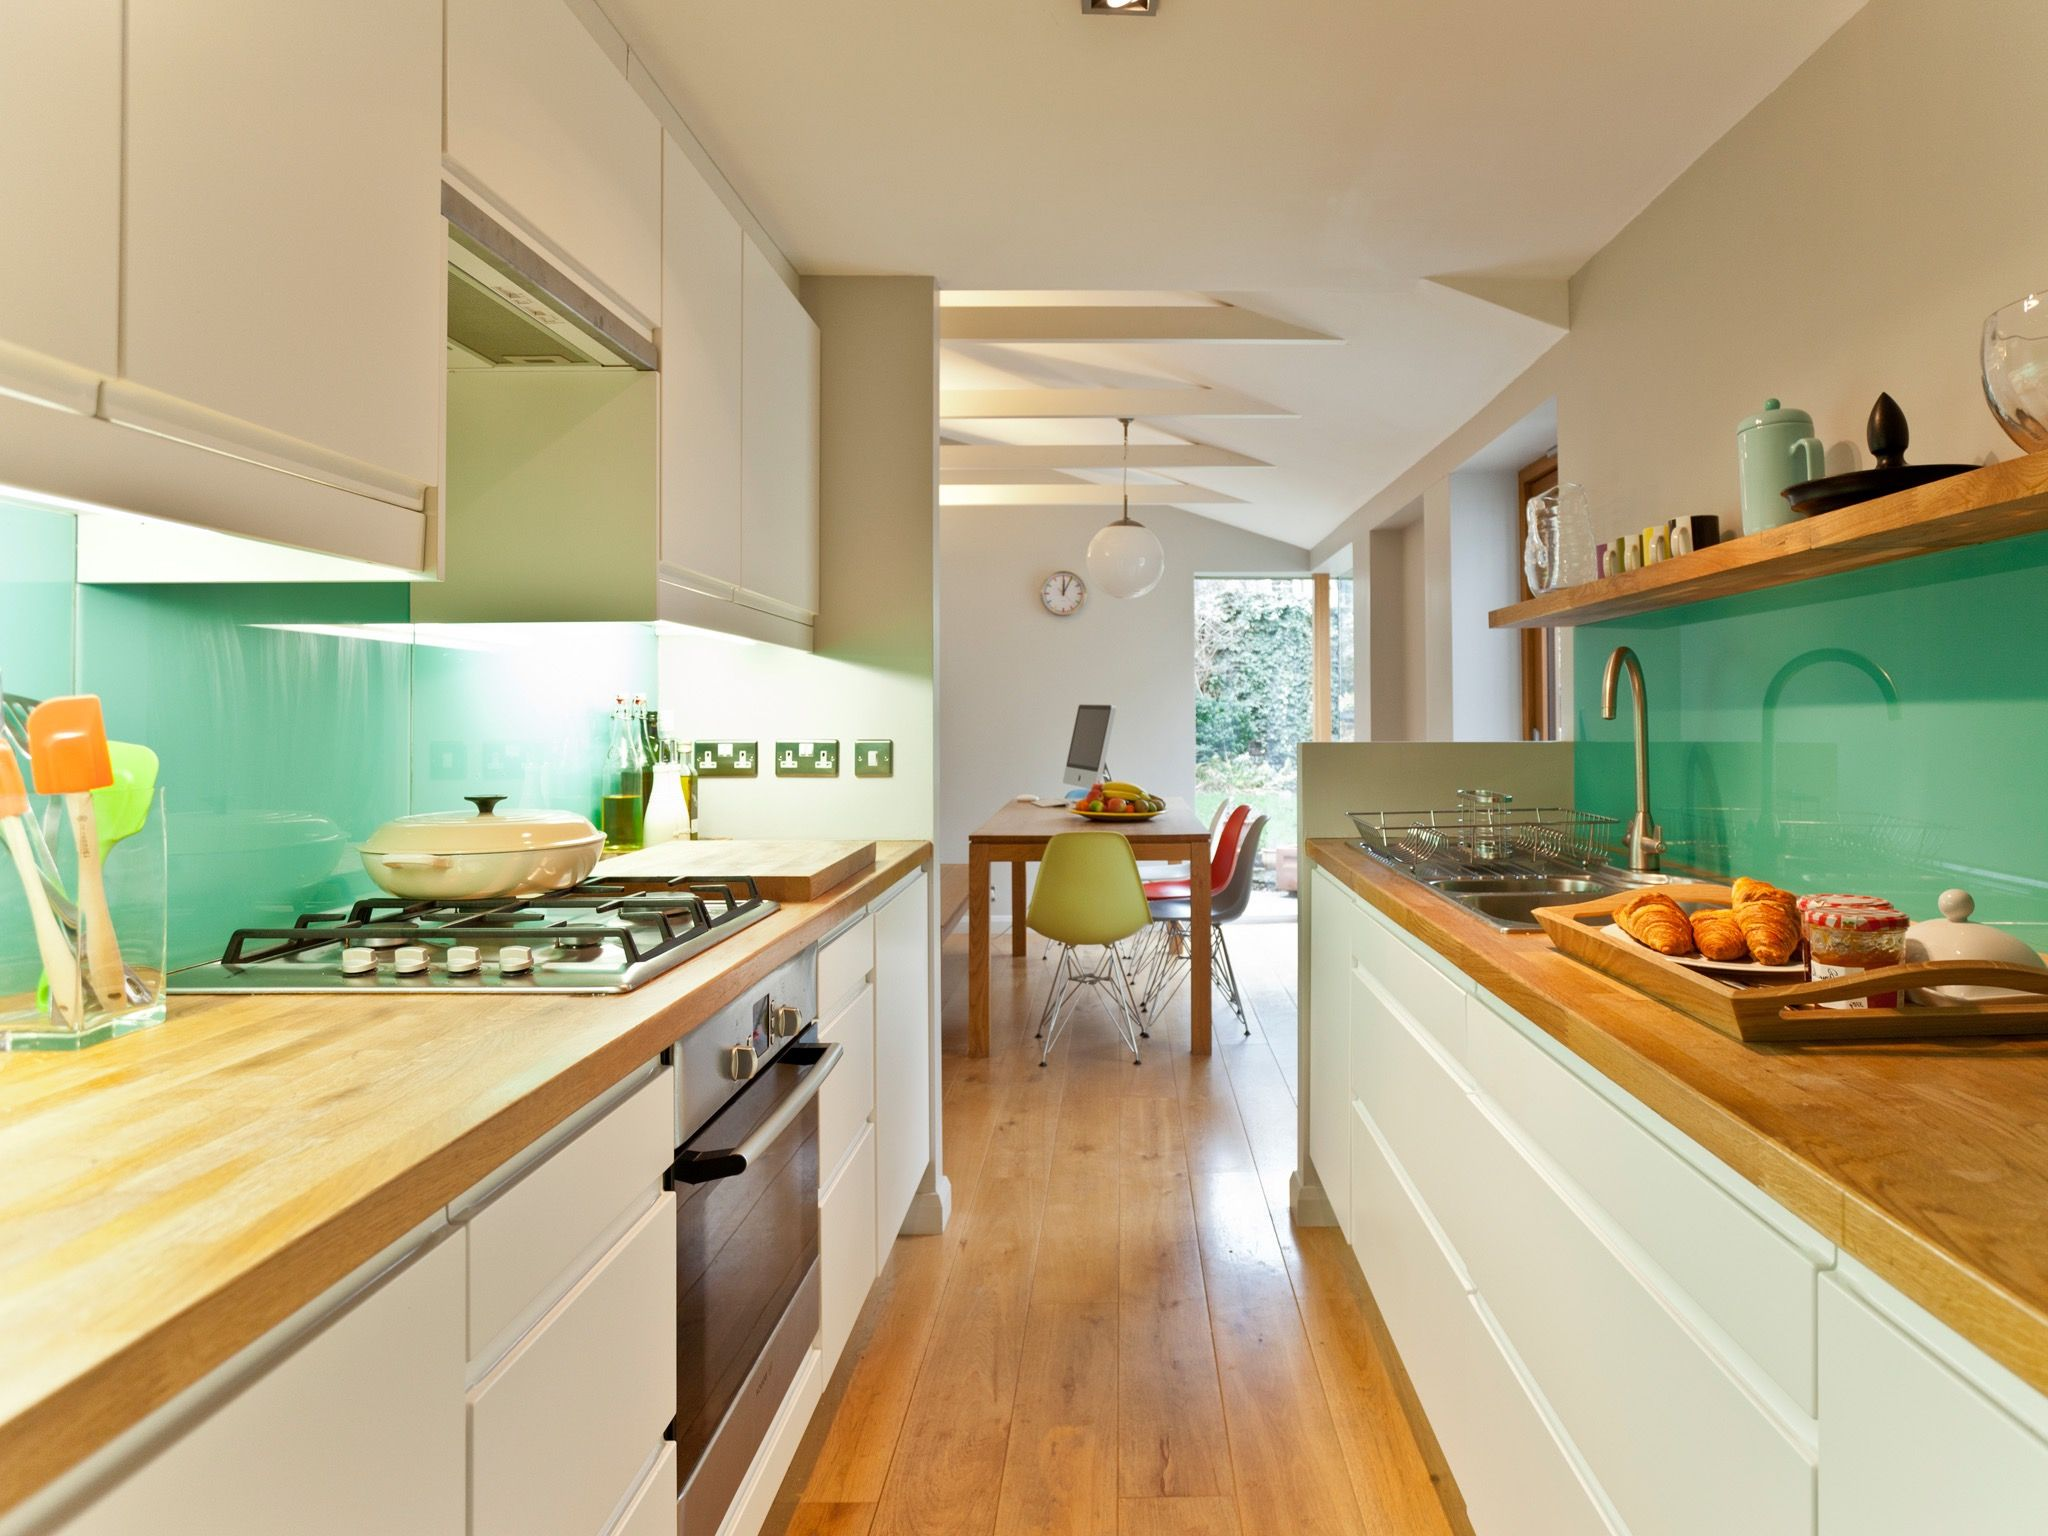 9 Kitchen Design Ideas for Long Narrow Room   Schmale küche ...